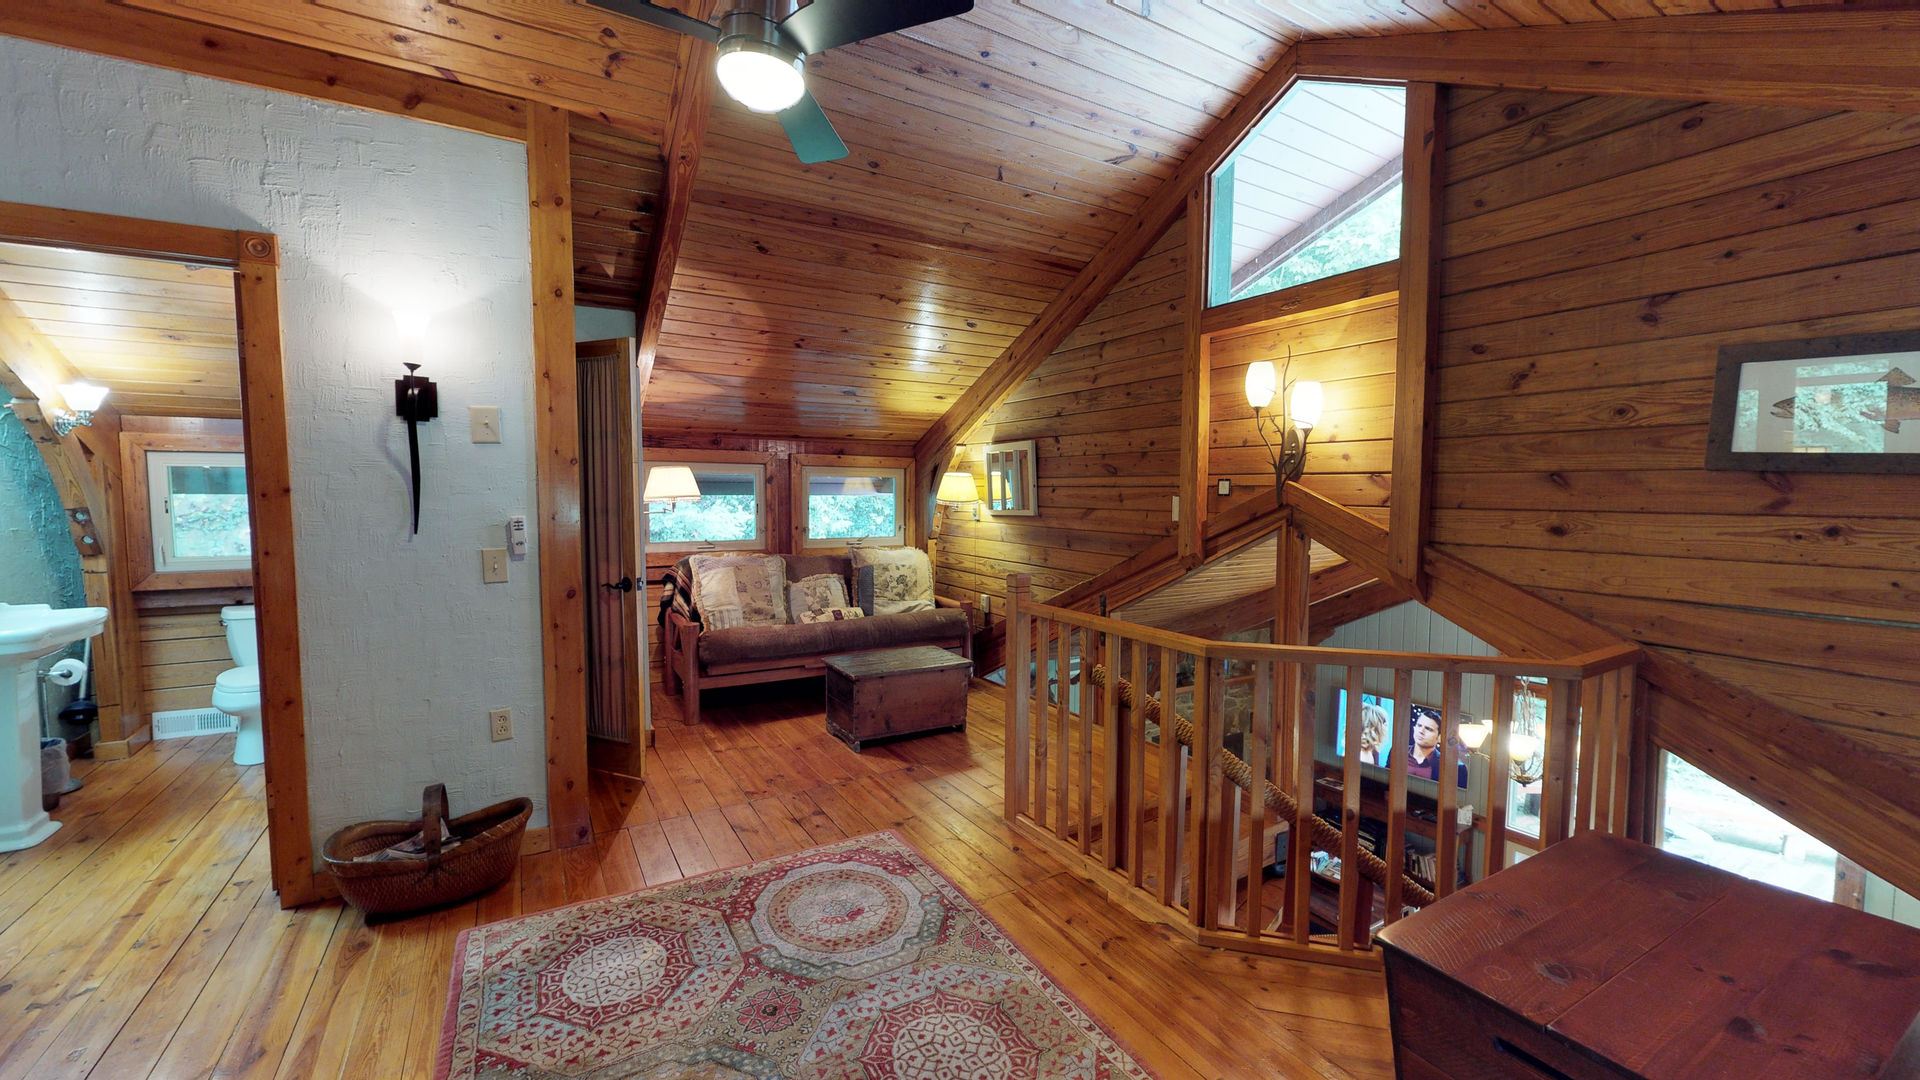 Upstairs area with futon